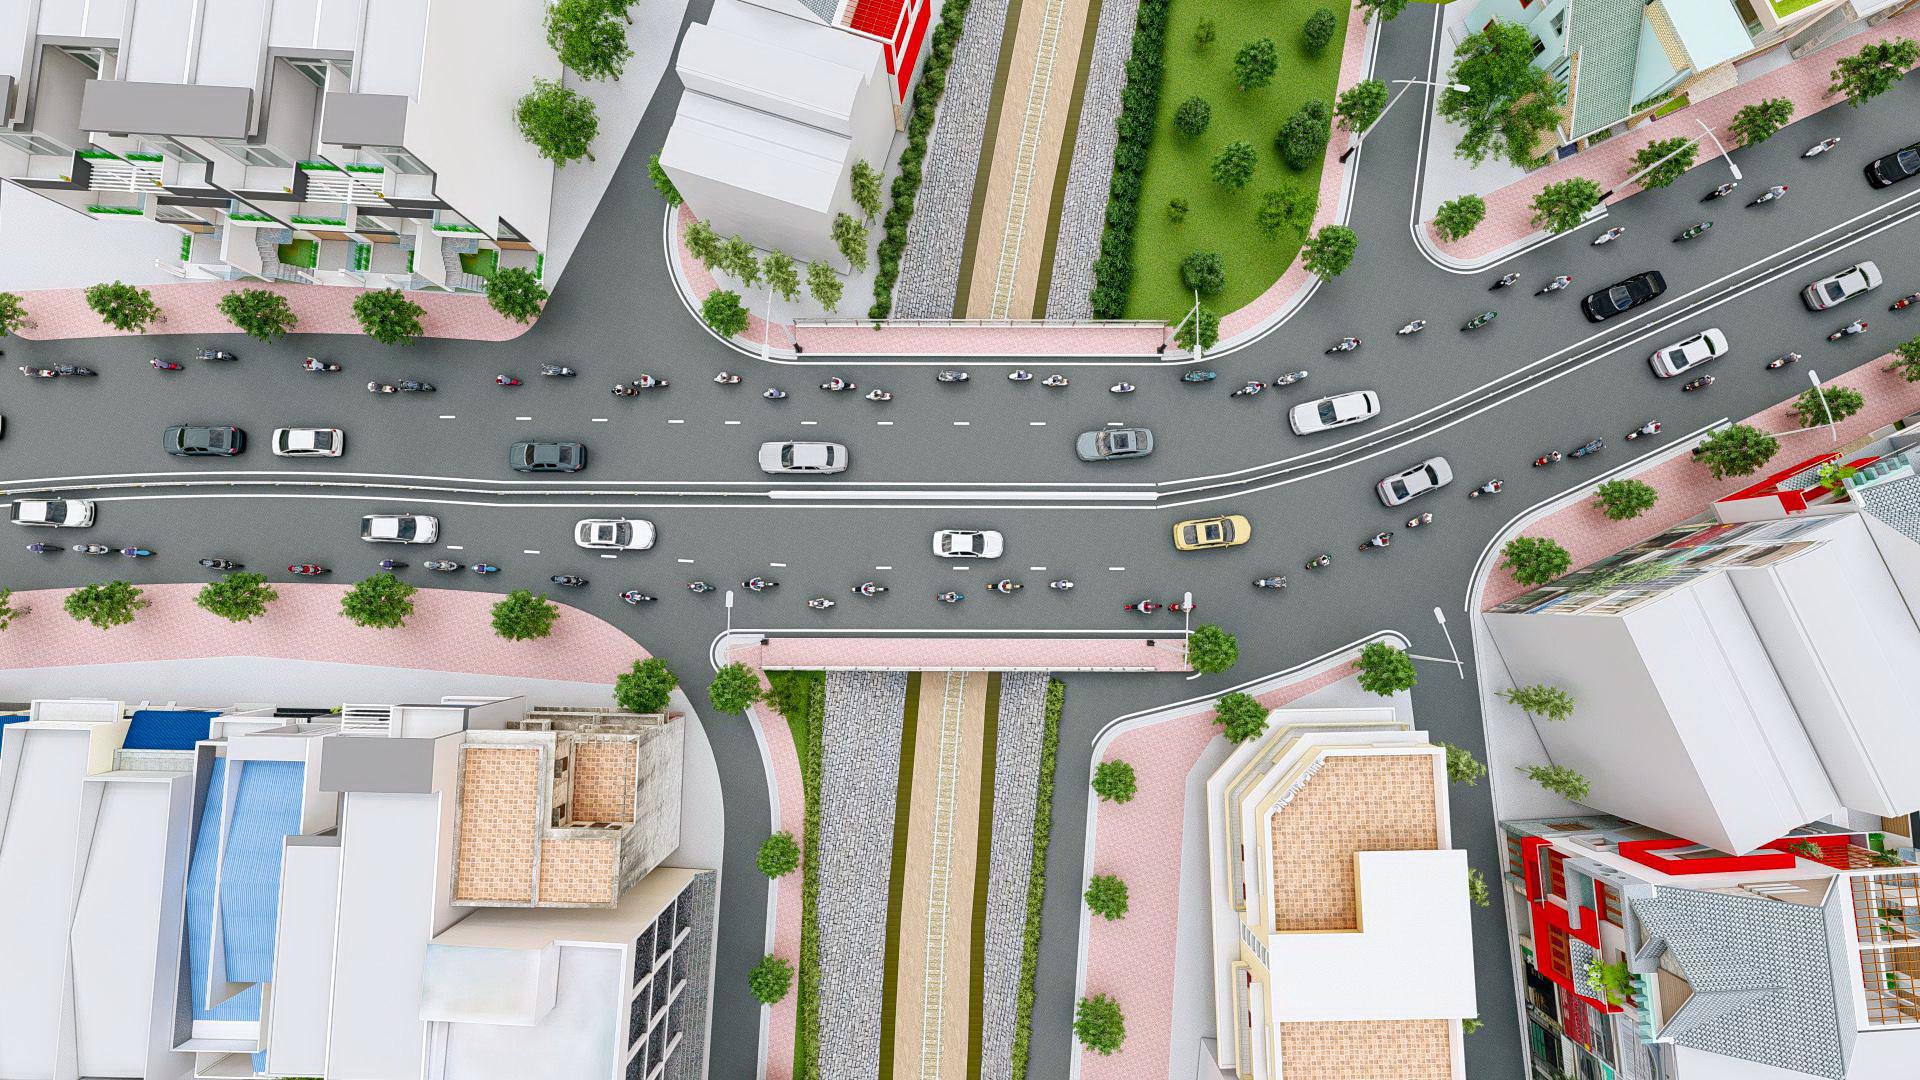 Saigon to spend $17.5mn on bridge expansion to alleviate congestion